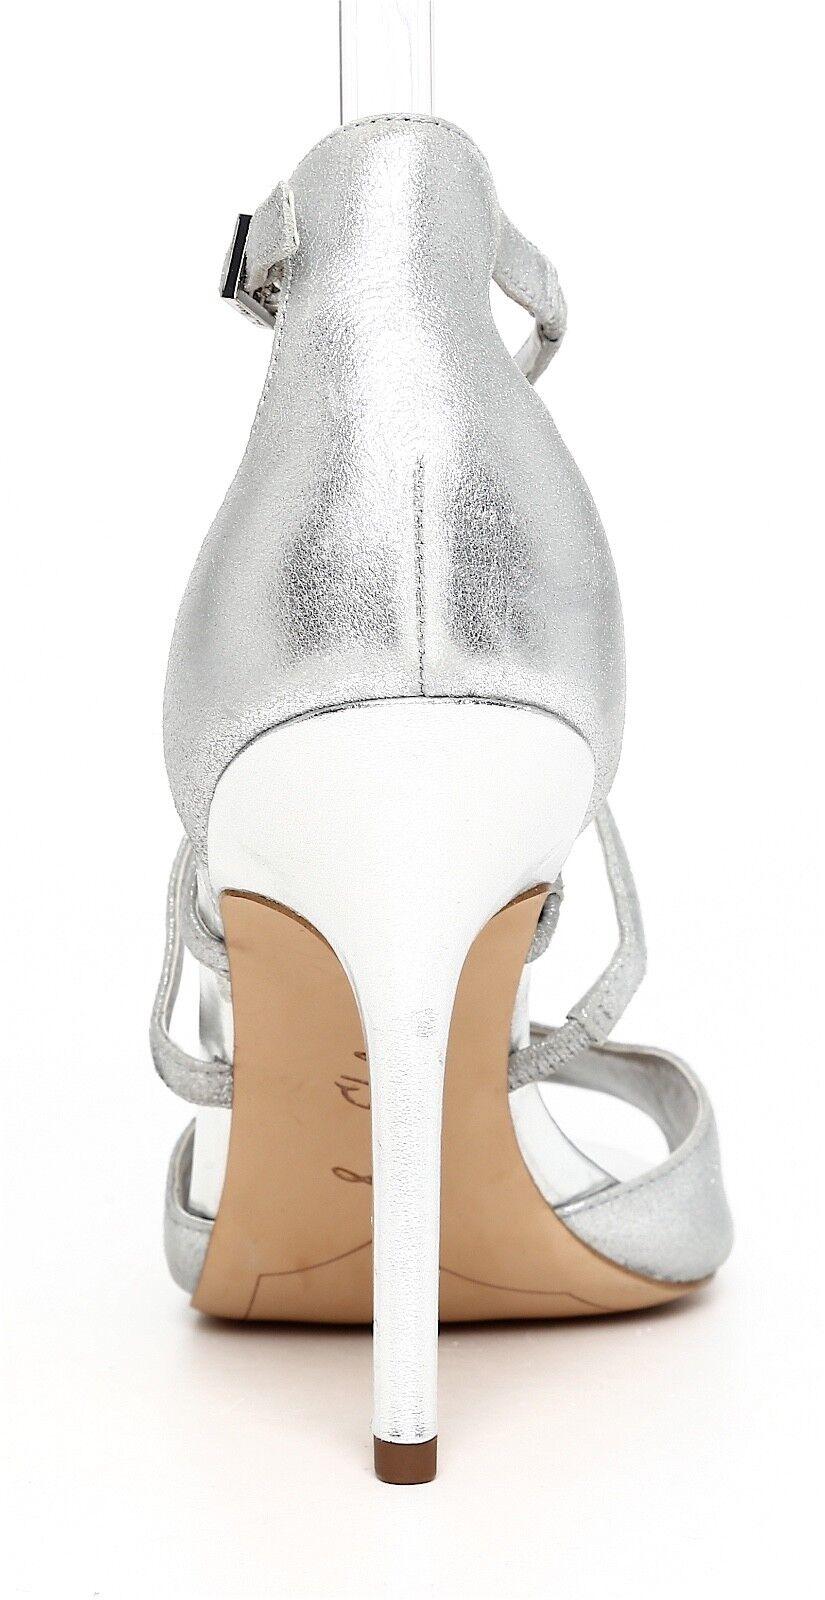 Sam 1313 Edelman Aeryn Leder Sandale Silver Damens Sz 9.5 1313 Sam 248031